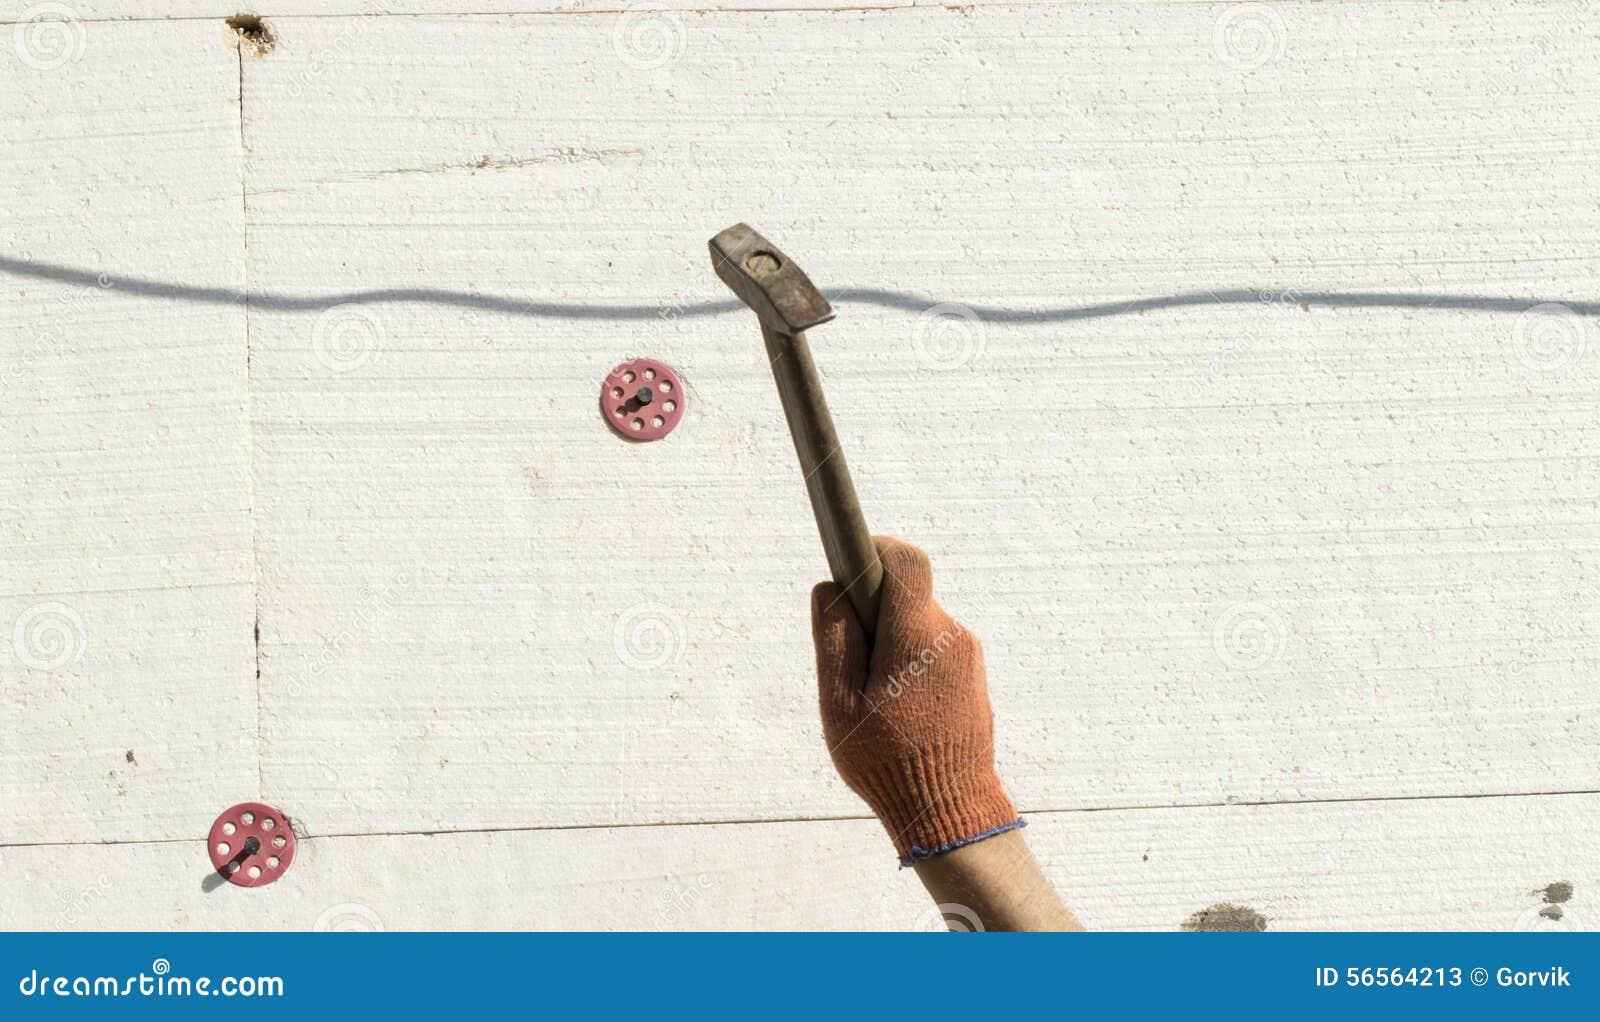 Download Η διαδικασία χρησιμοποιώντας ένα σφυρί μετάλλων Στοκ Εικόνα - εικόνα από σπίτι, σφυρί: 56564213